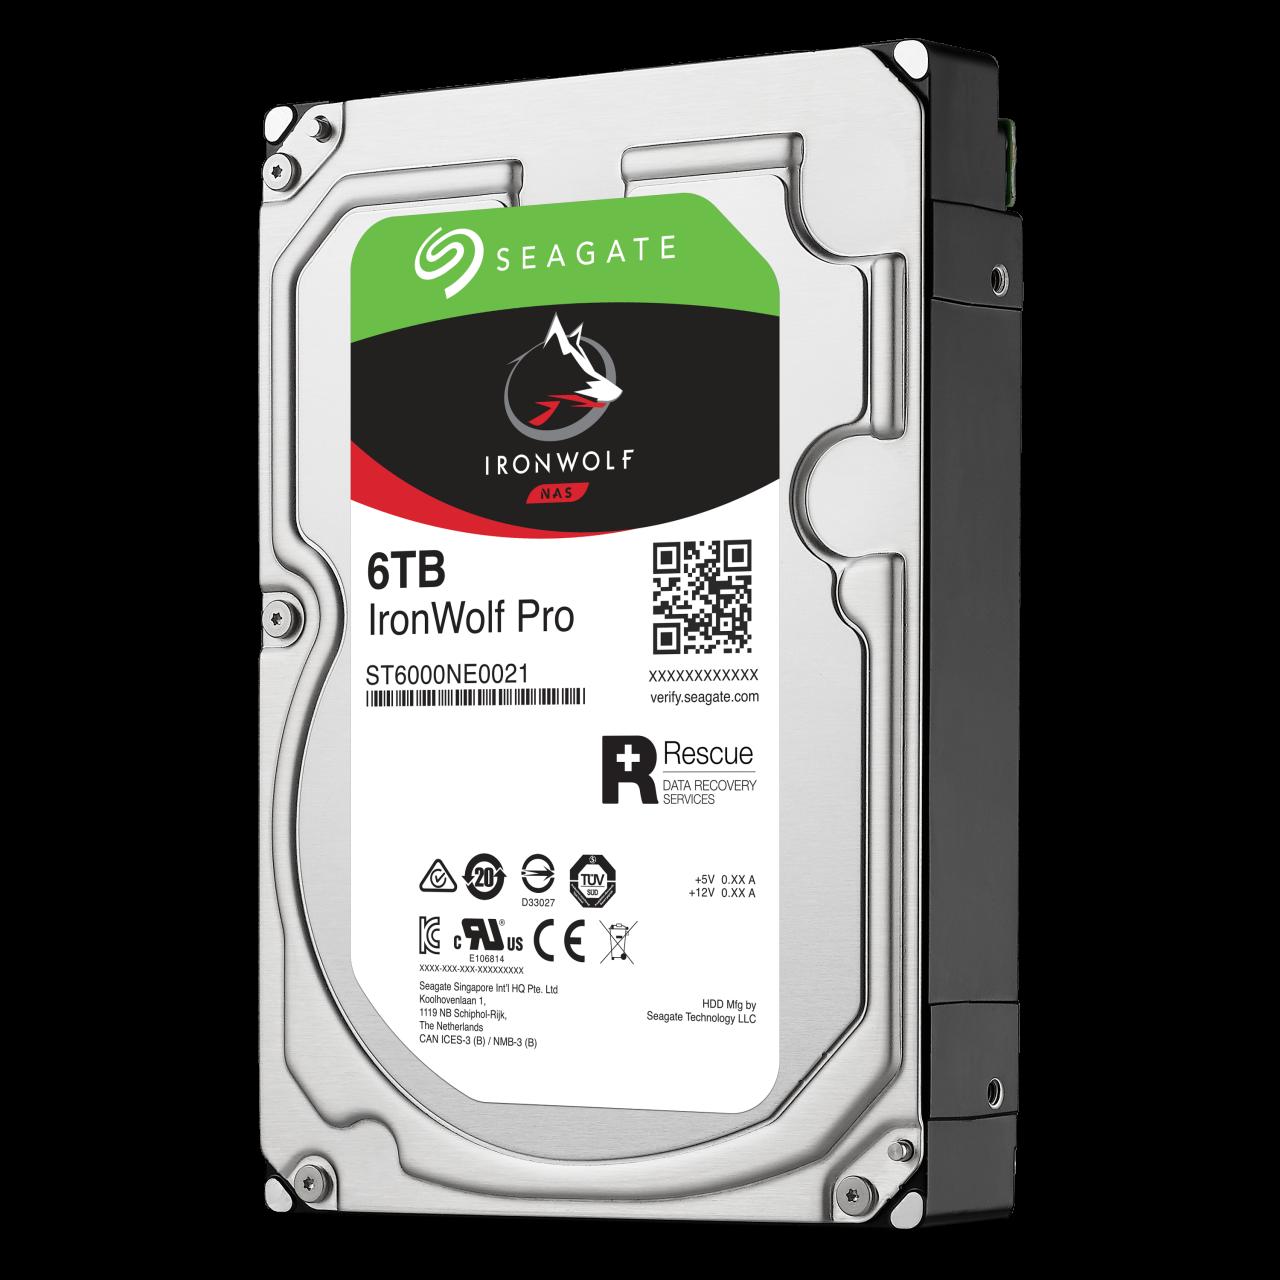 Seagate IronWolf Pro NAS HDD 6TB